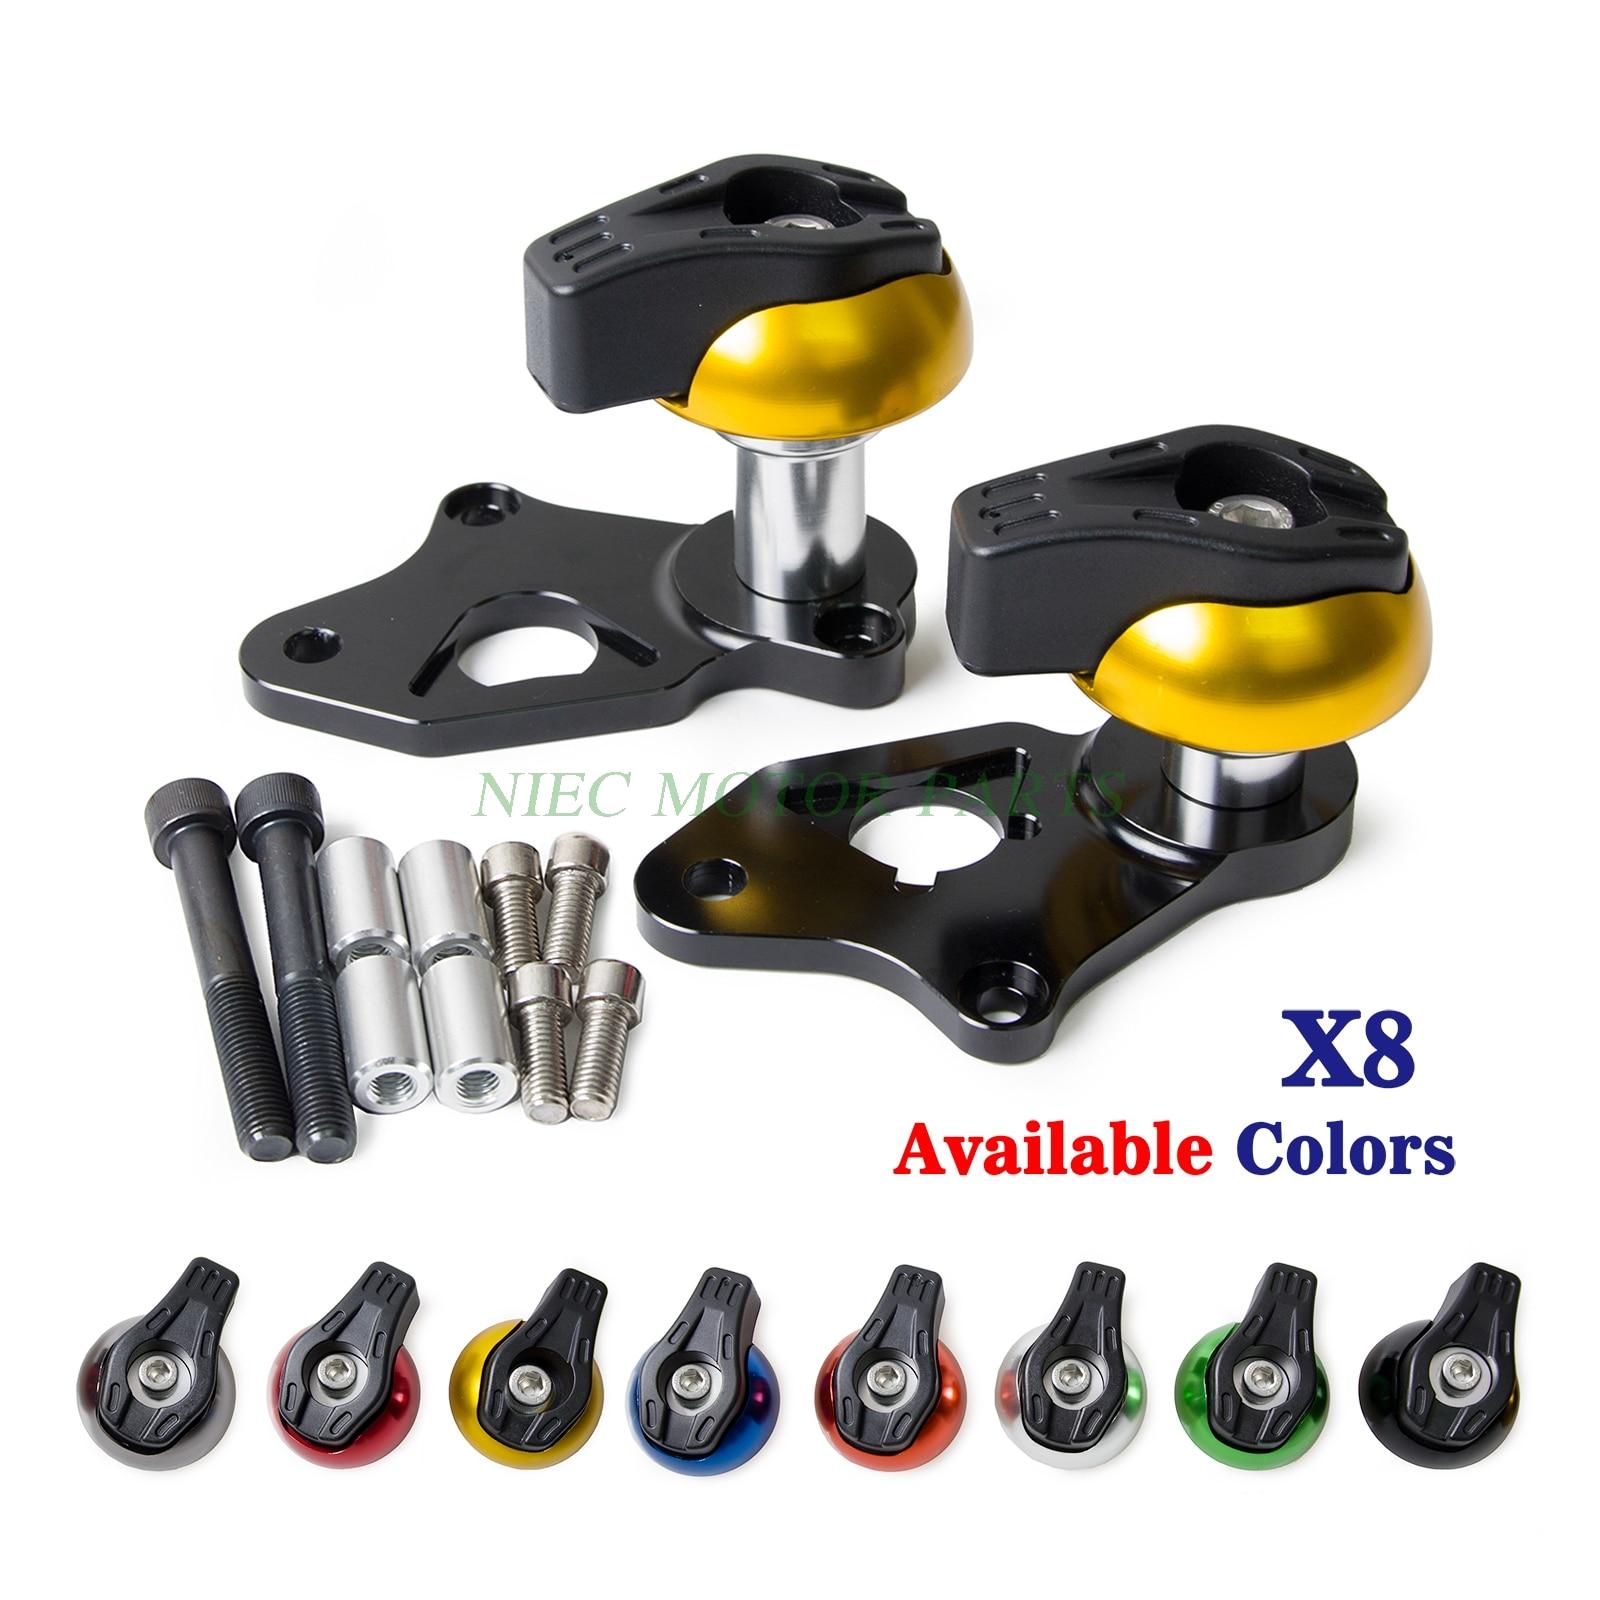 Motorcycle  Aluminium Frame Sliders Crash Pads Protector For Suzuki GSXR600 GSXR750 2006 2007 2009 2009 2010 2011 2012 radiator grille protective cover grill guard protector for suzuki gsxr600 gsxr750 gsxr 600 750 2006 2007 2008 2009 2010 2016